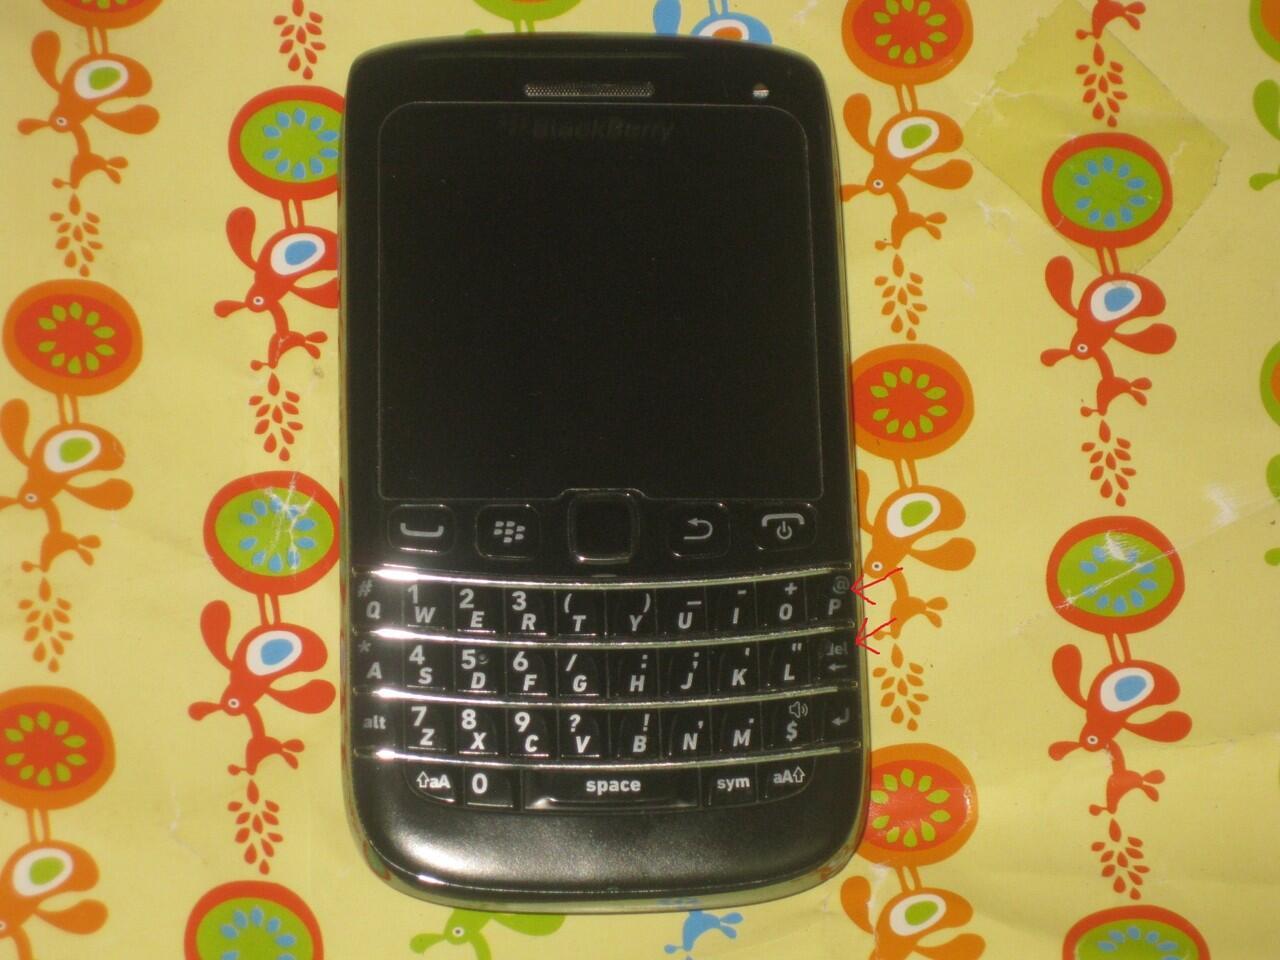 BLACKBERRY ONYX 3 9790 aka BELAGIO (jogja)